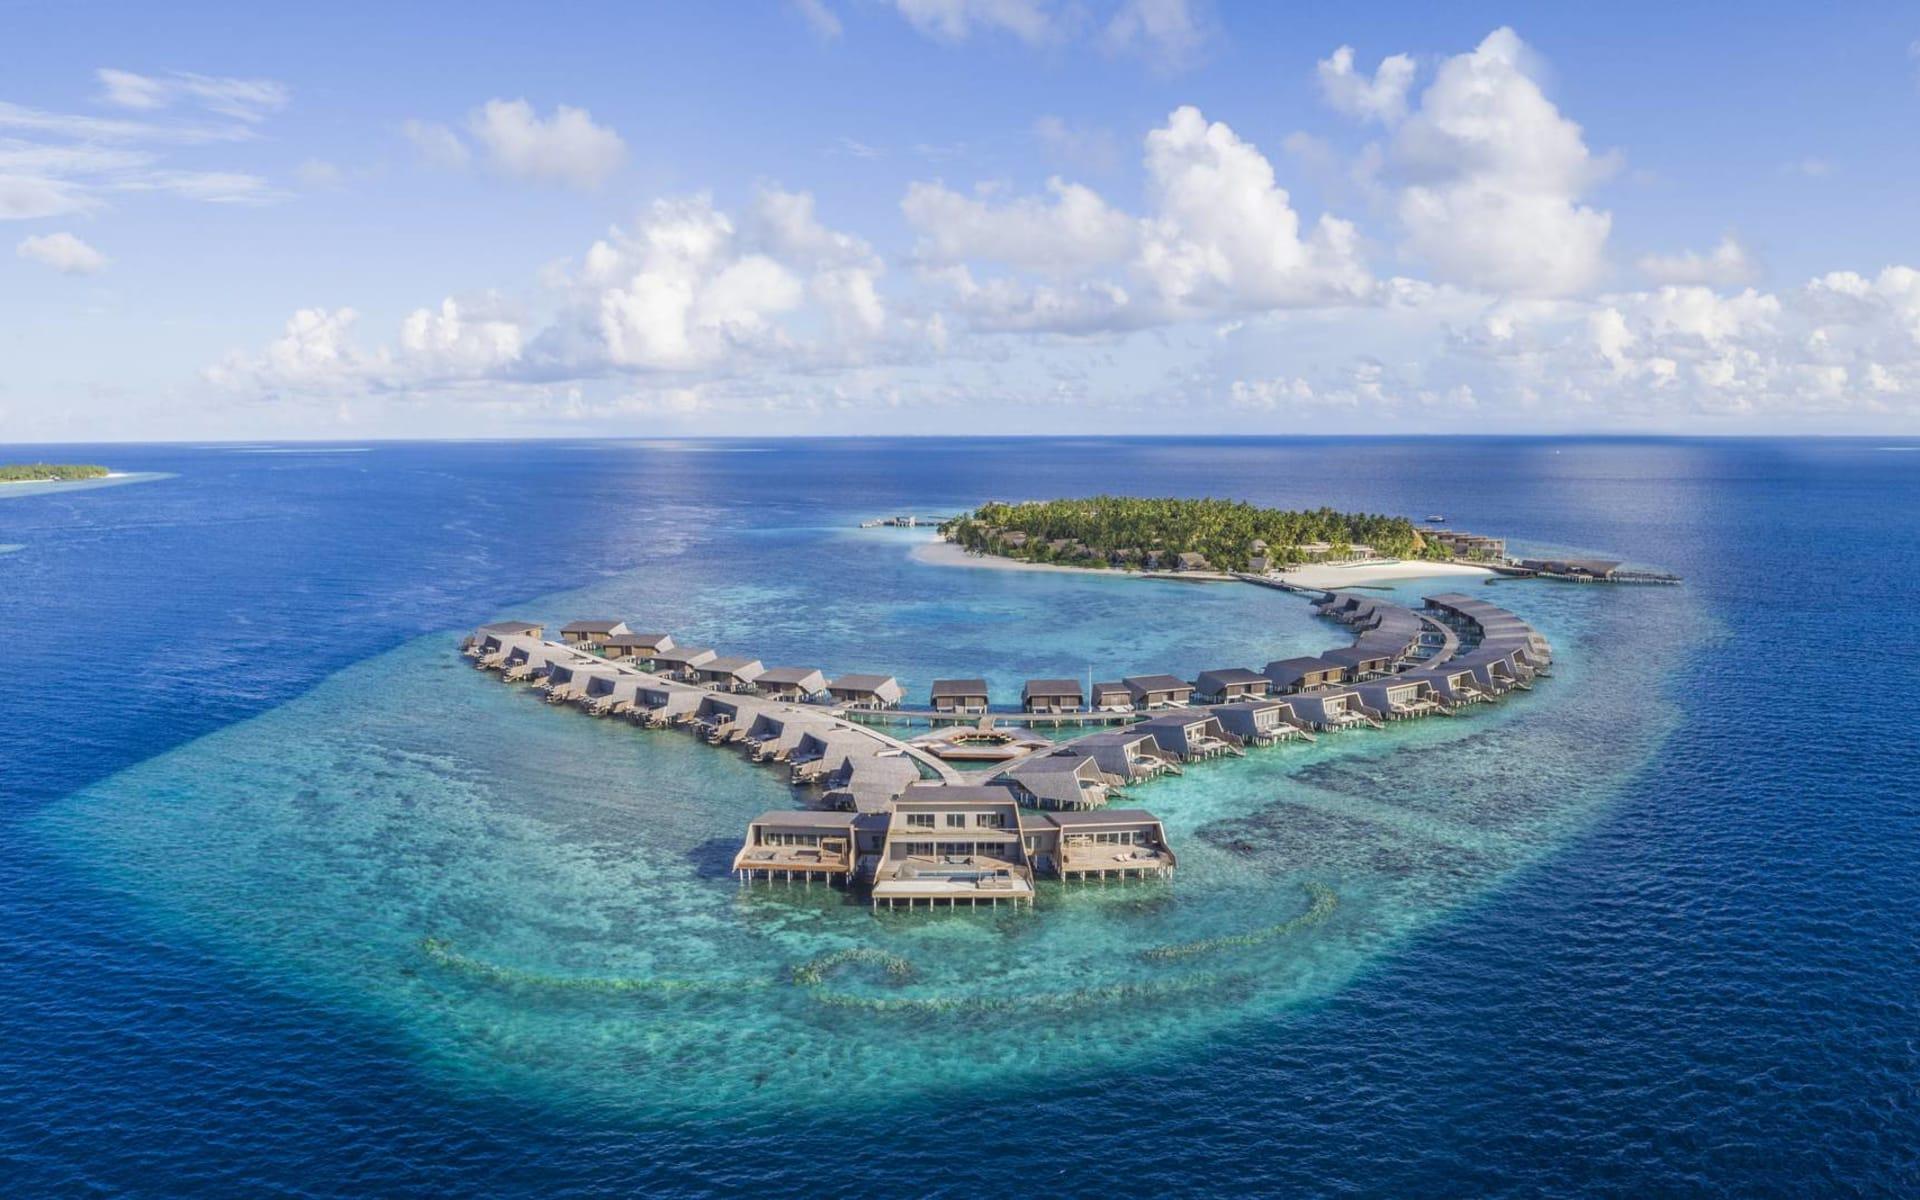 The St. Regis Maldives Vommuli Resort in Dhaalu-Atoll: